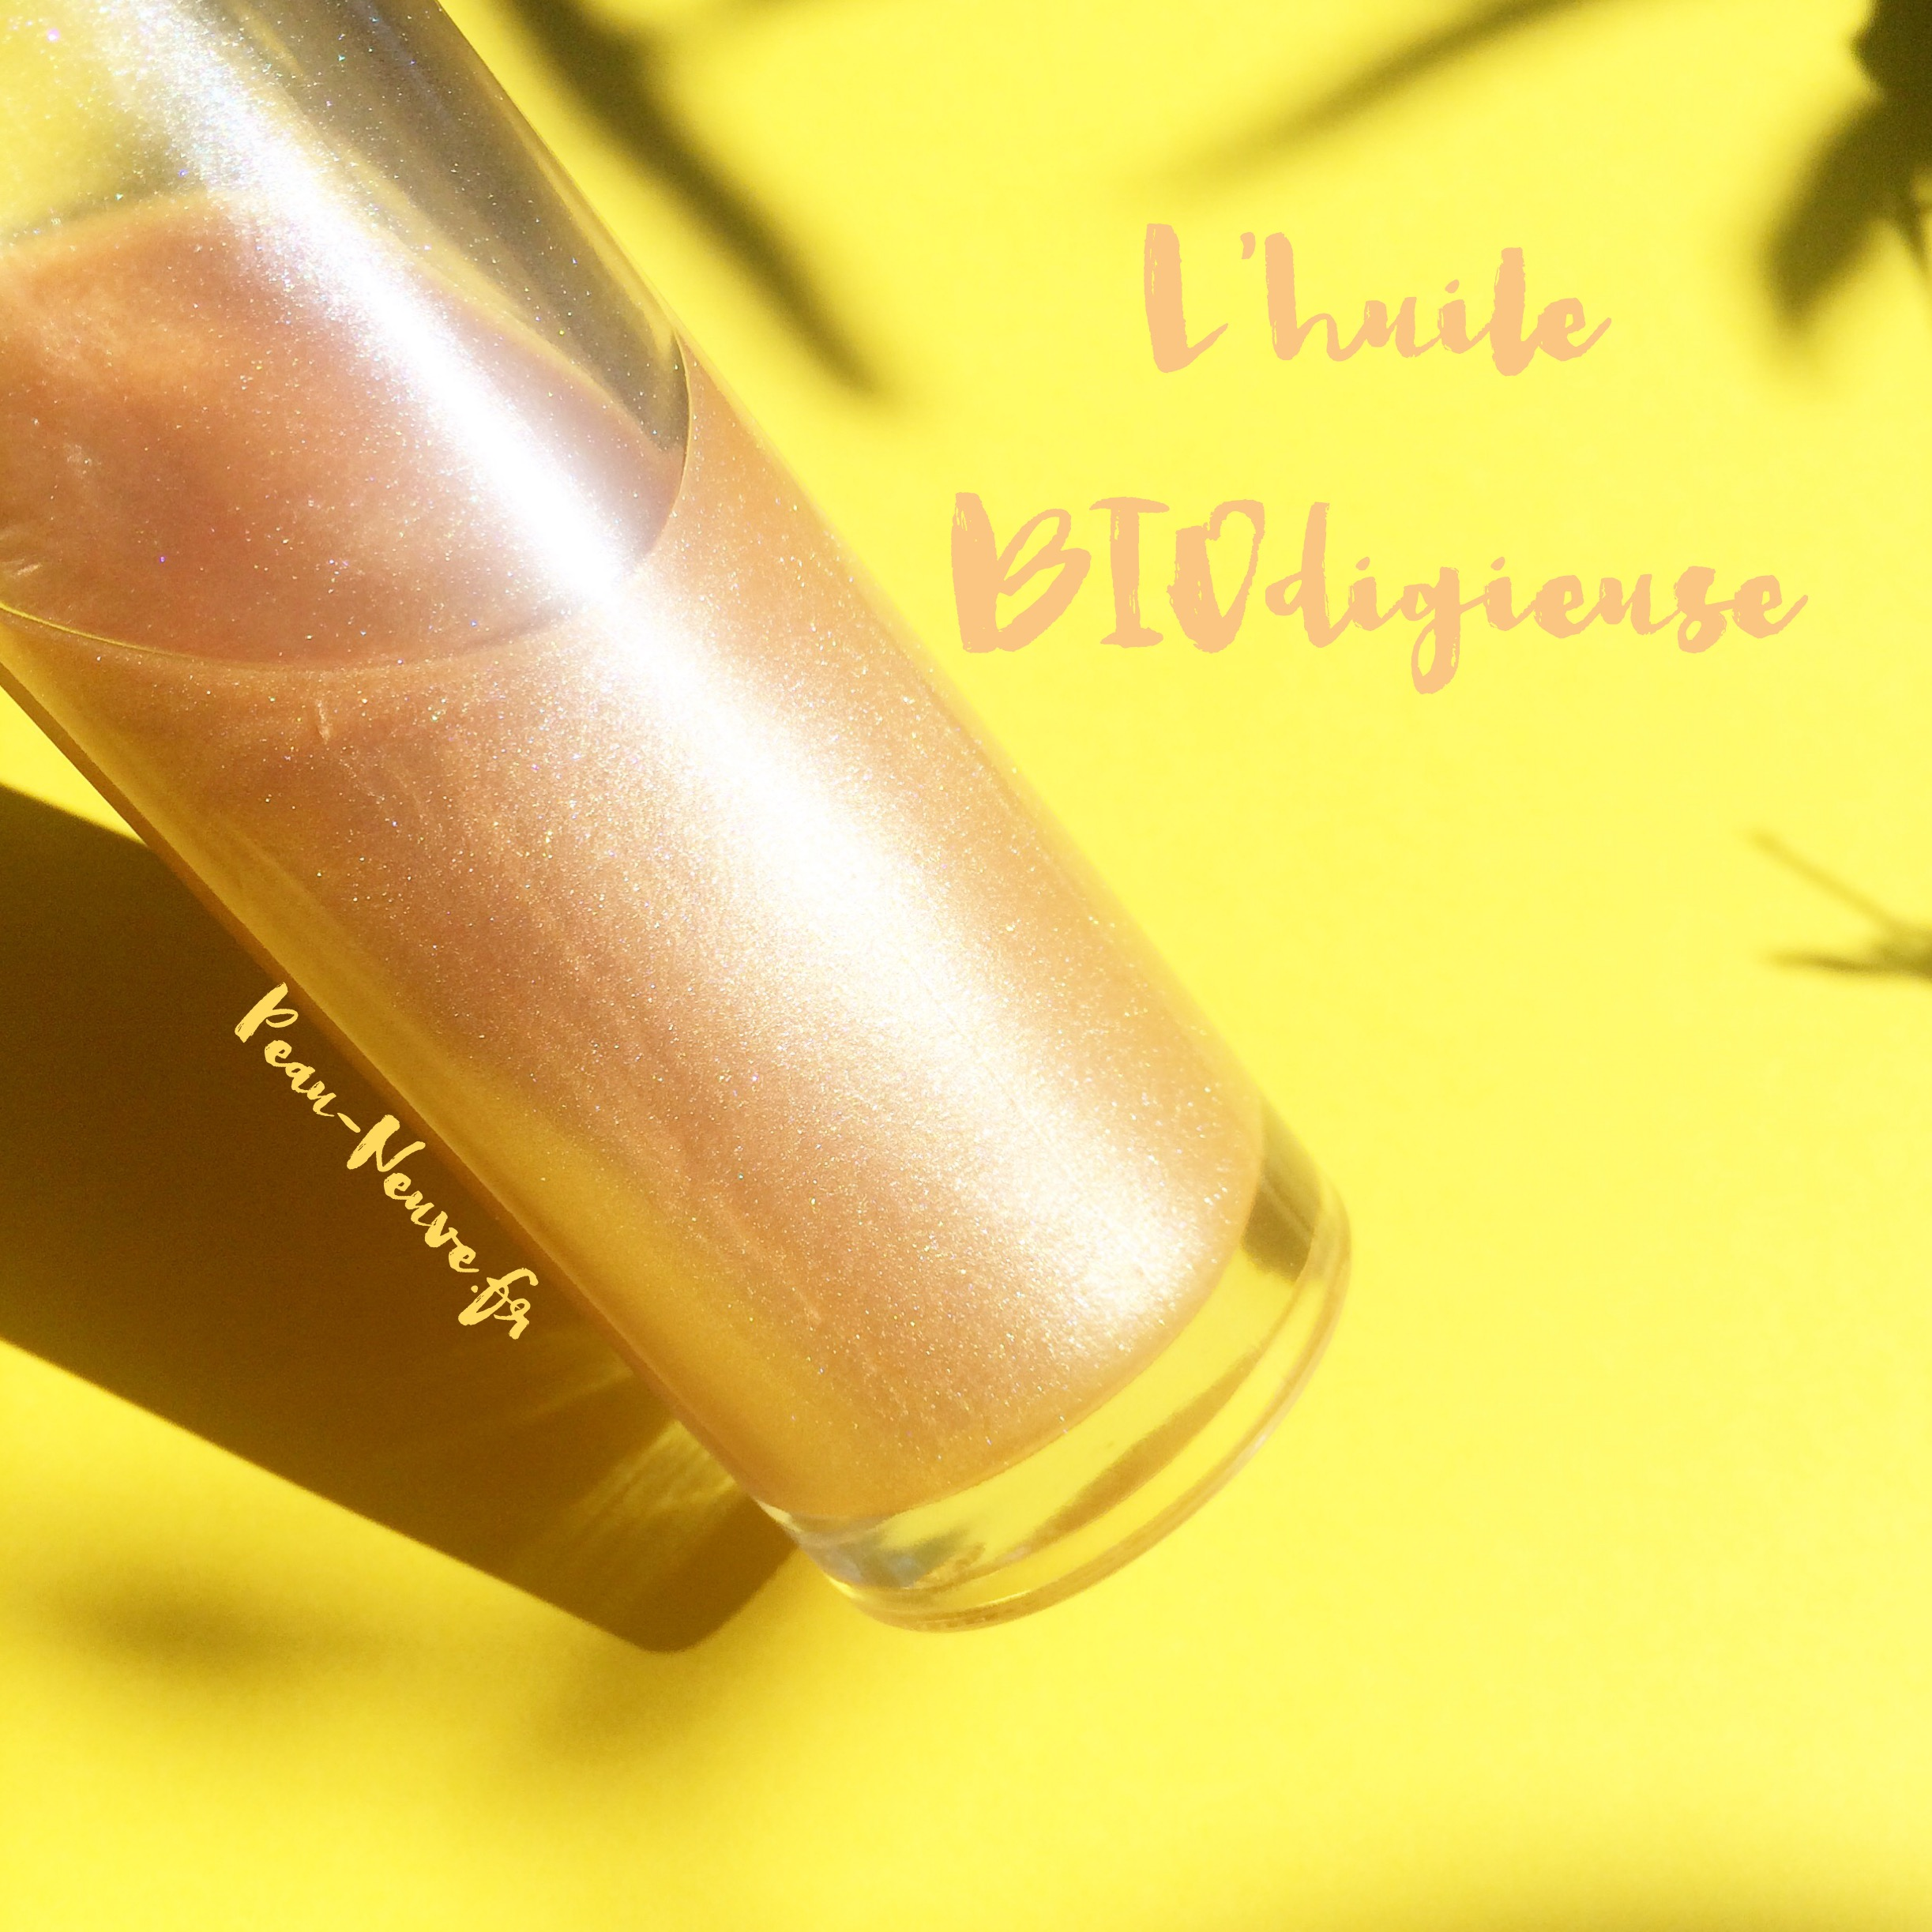 L'huile BIOdigieuse #DUPE + ma recette